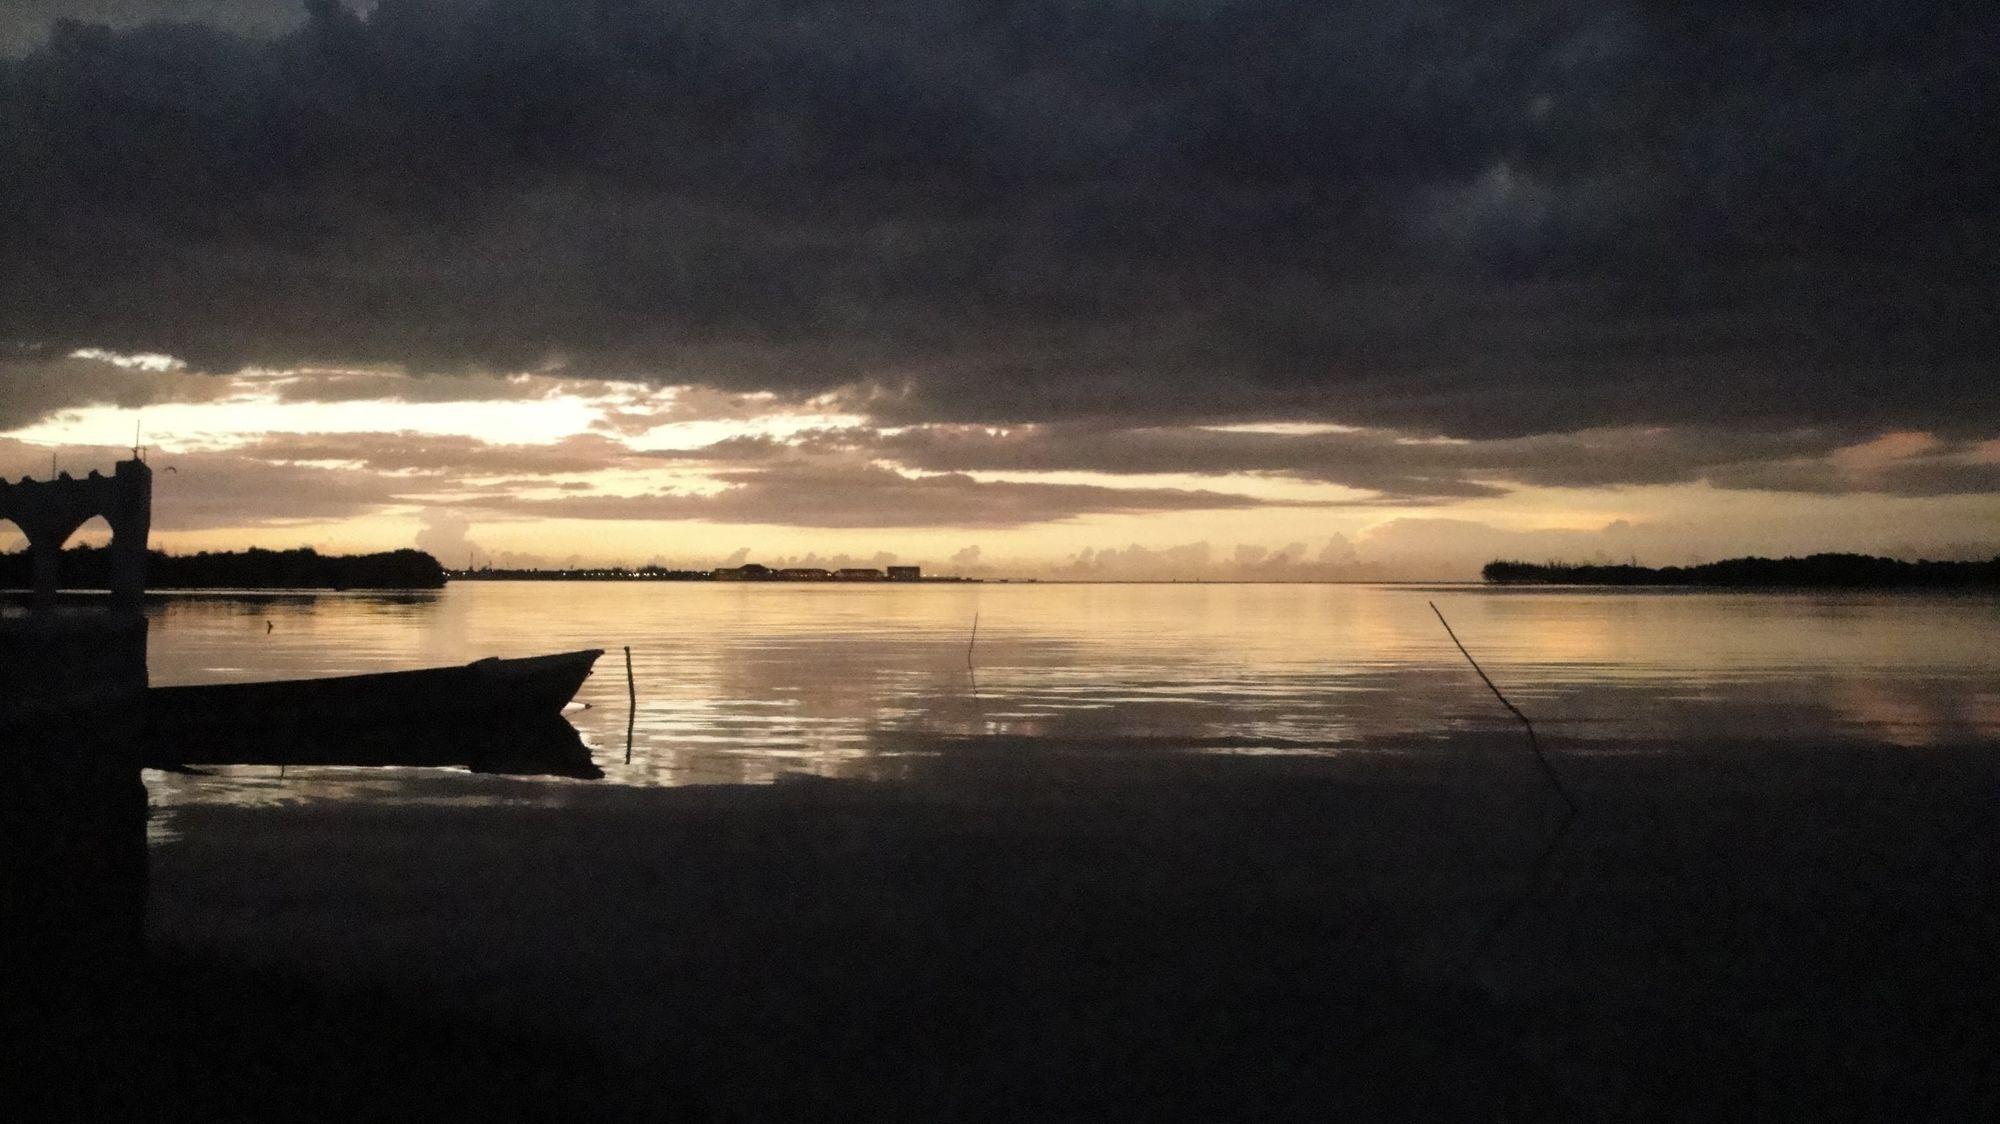 La laguna luminosa al atardecer